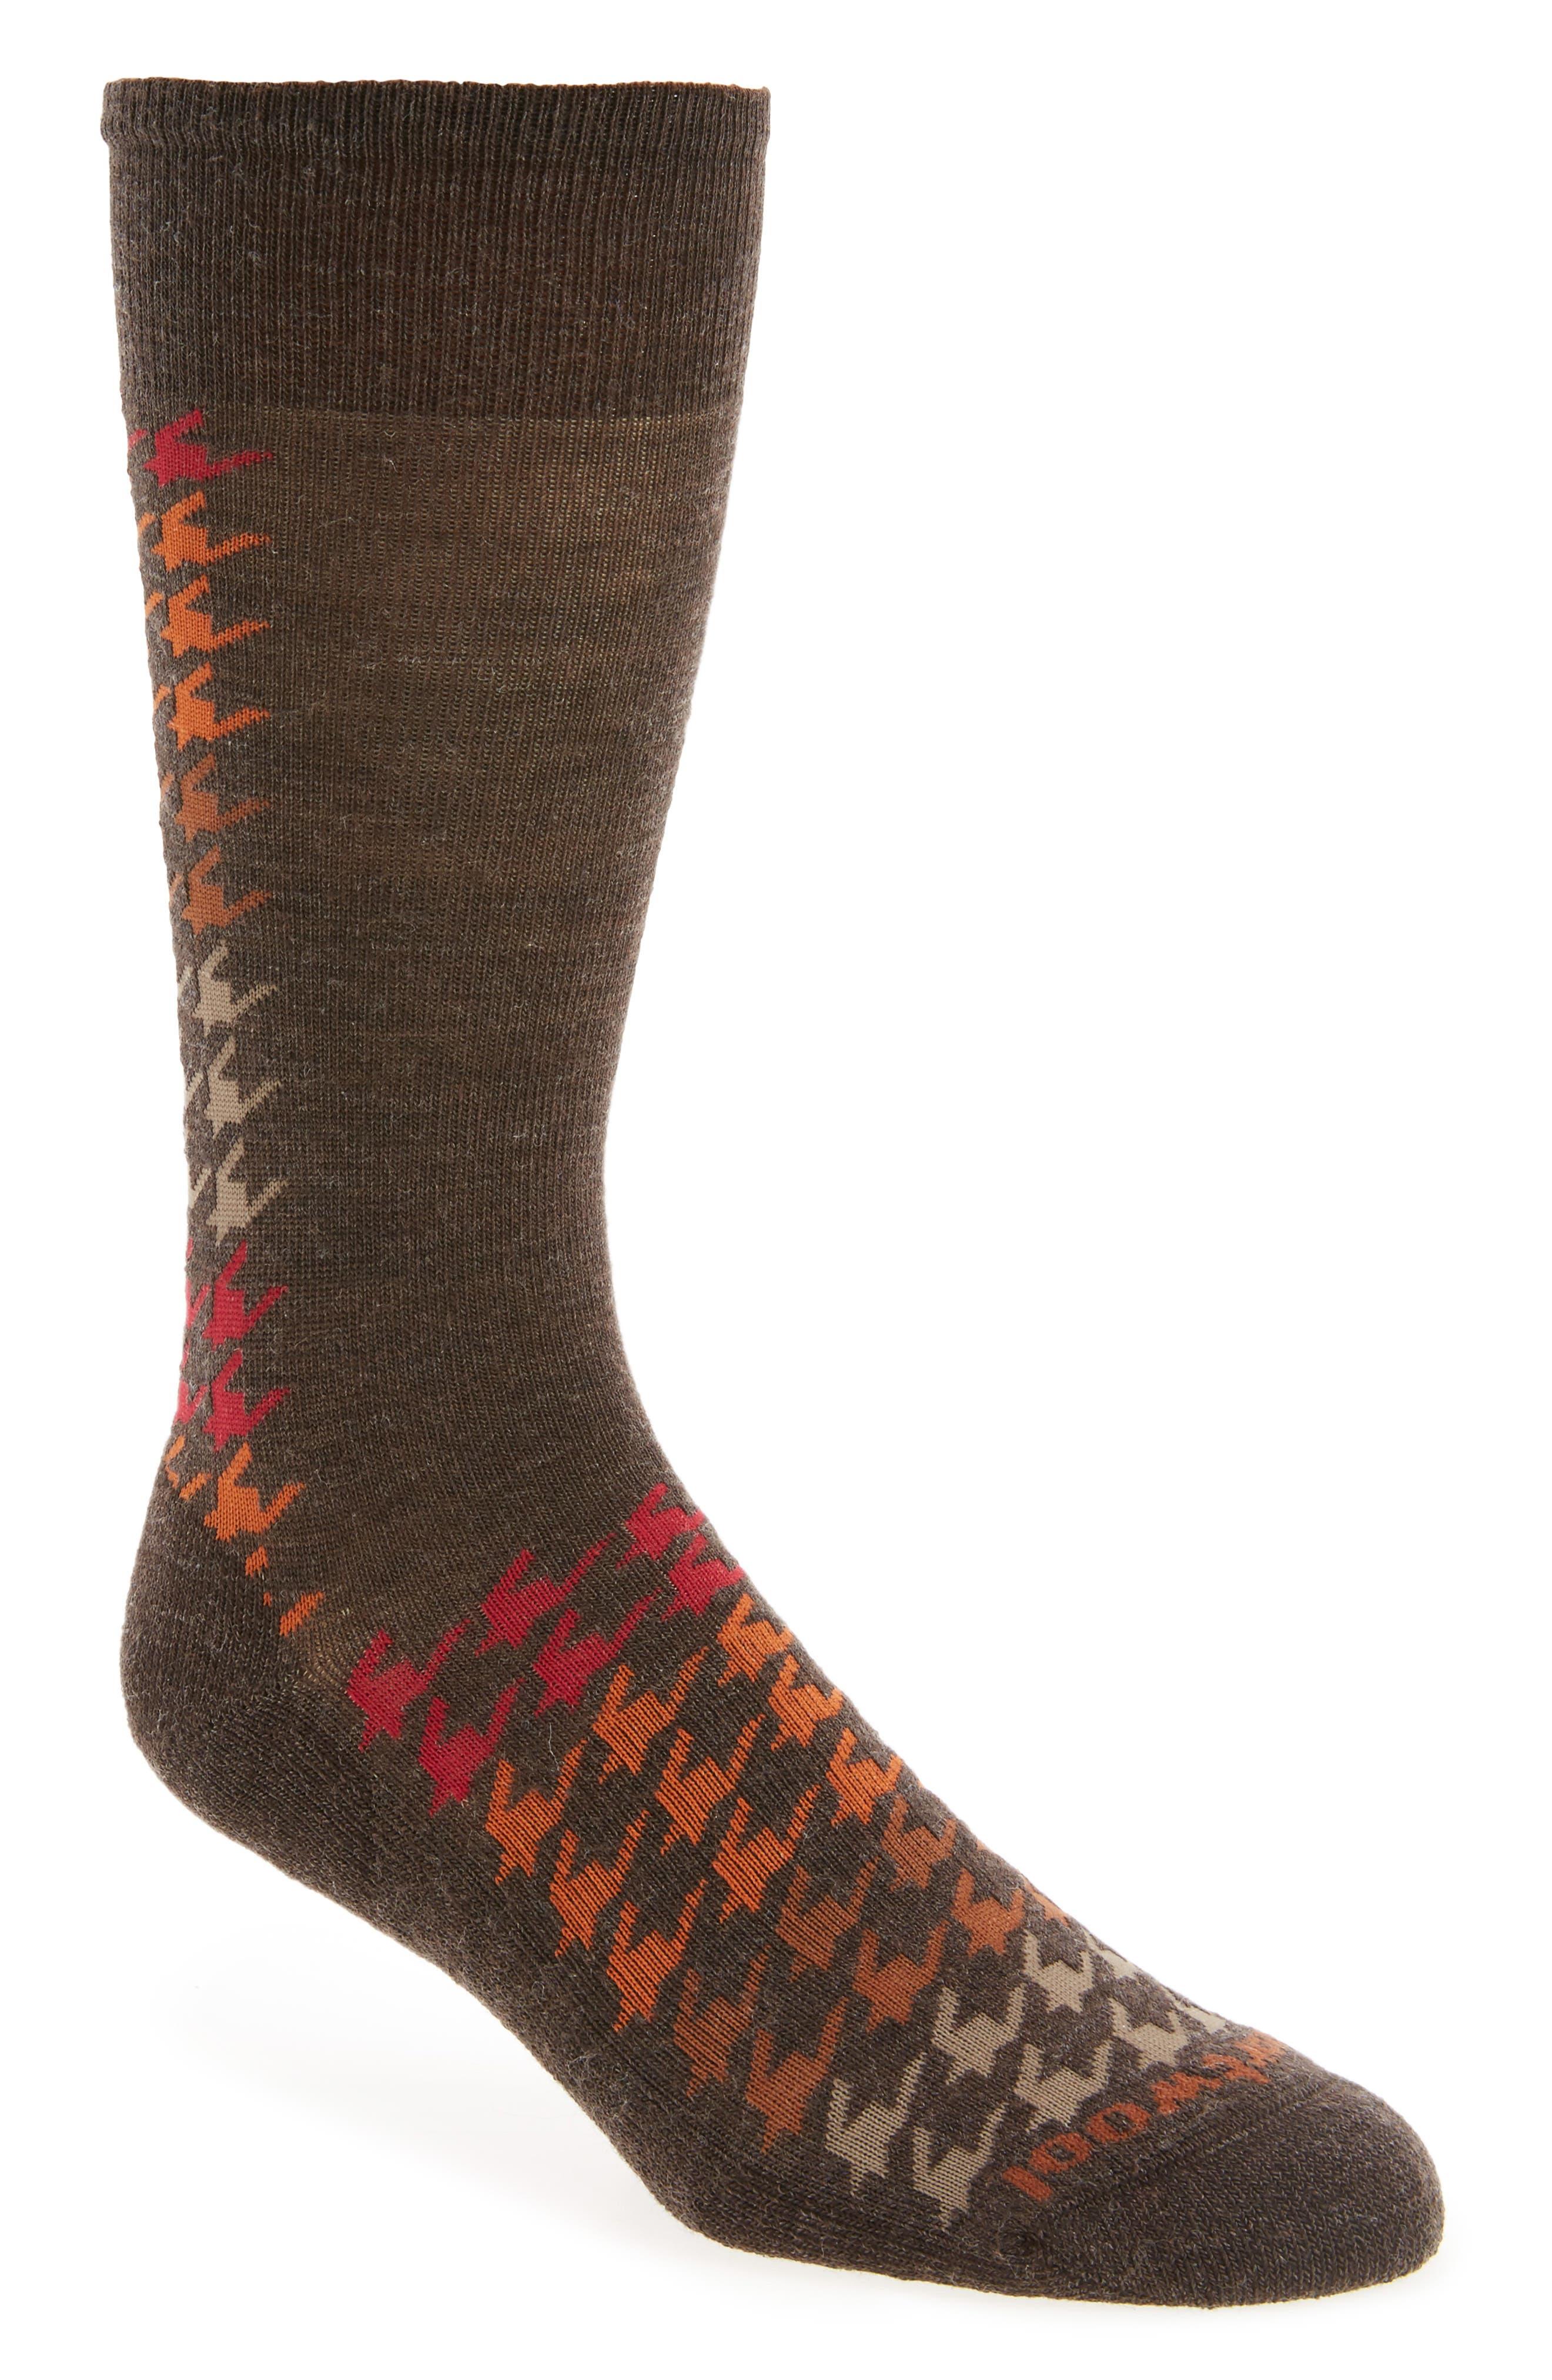 Smartwool Houndstooth Socks